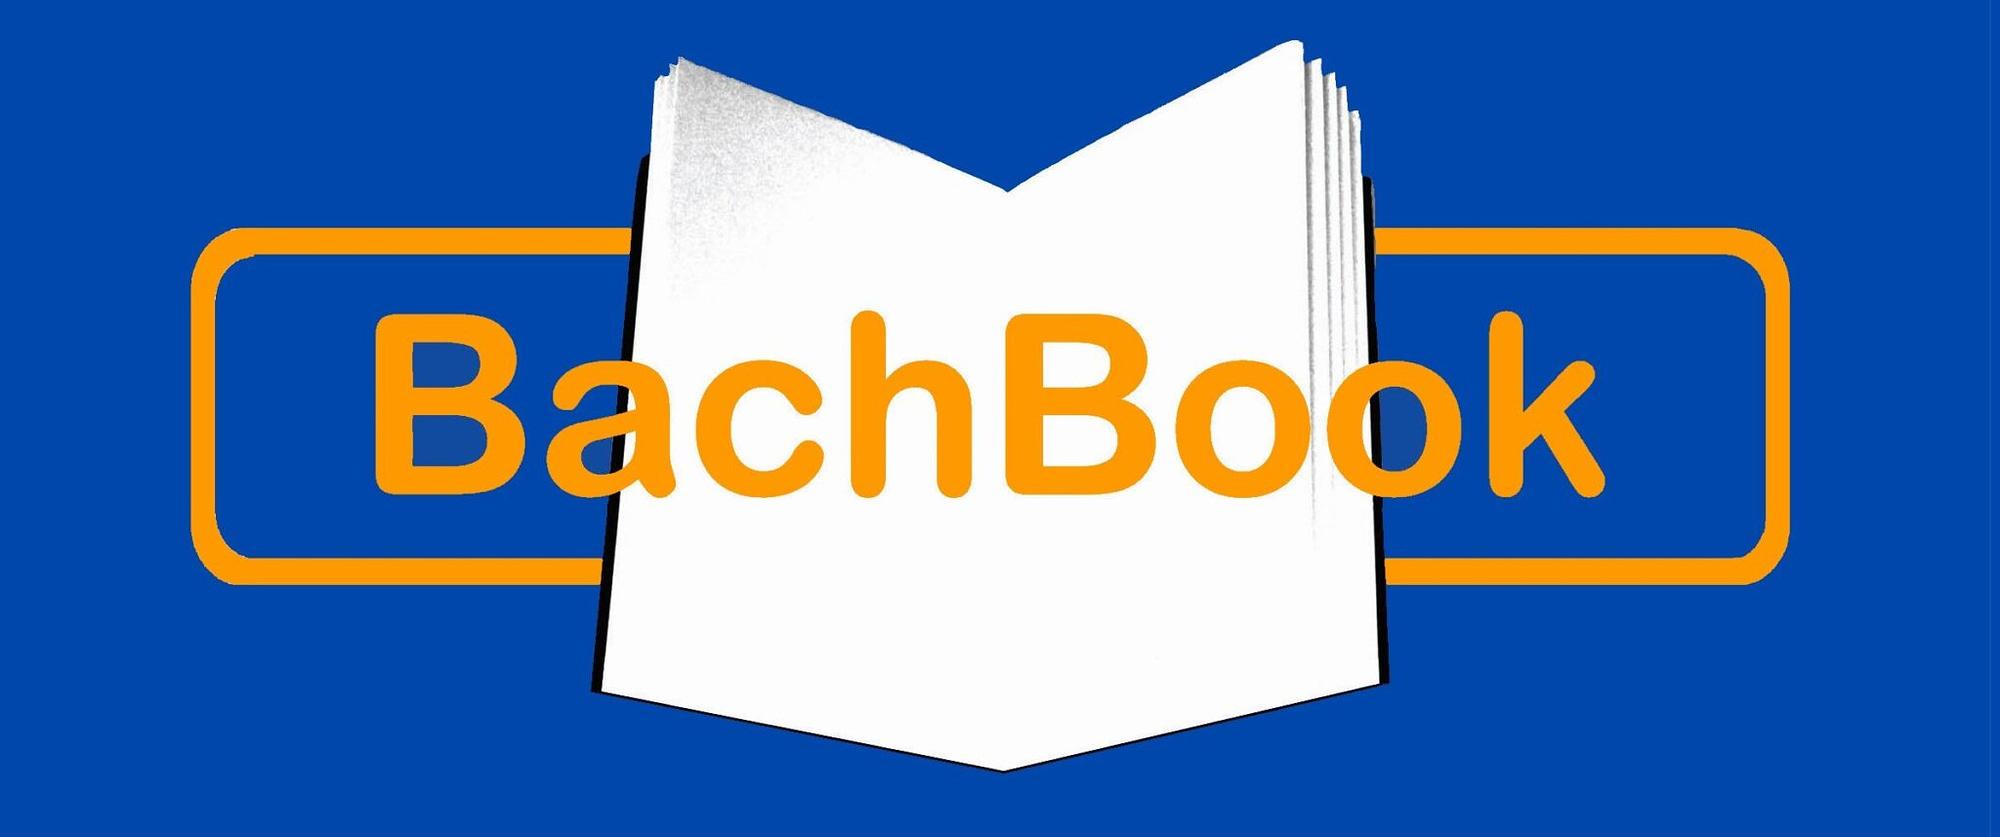 bachbook